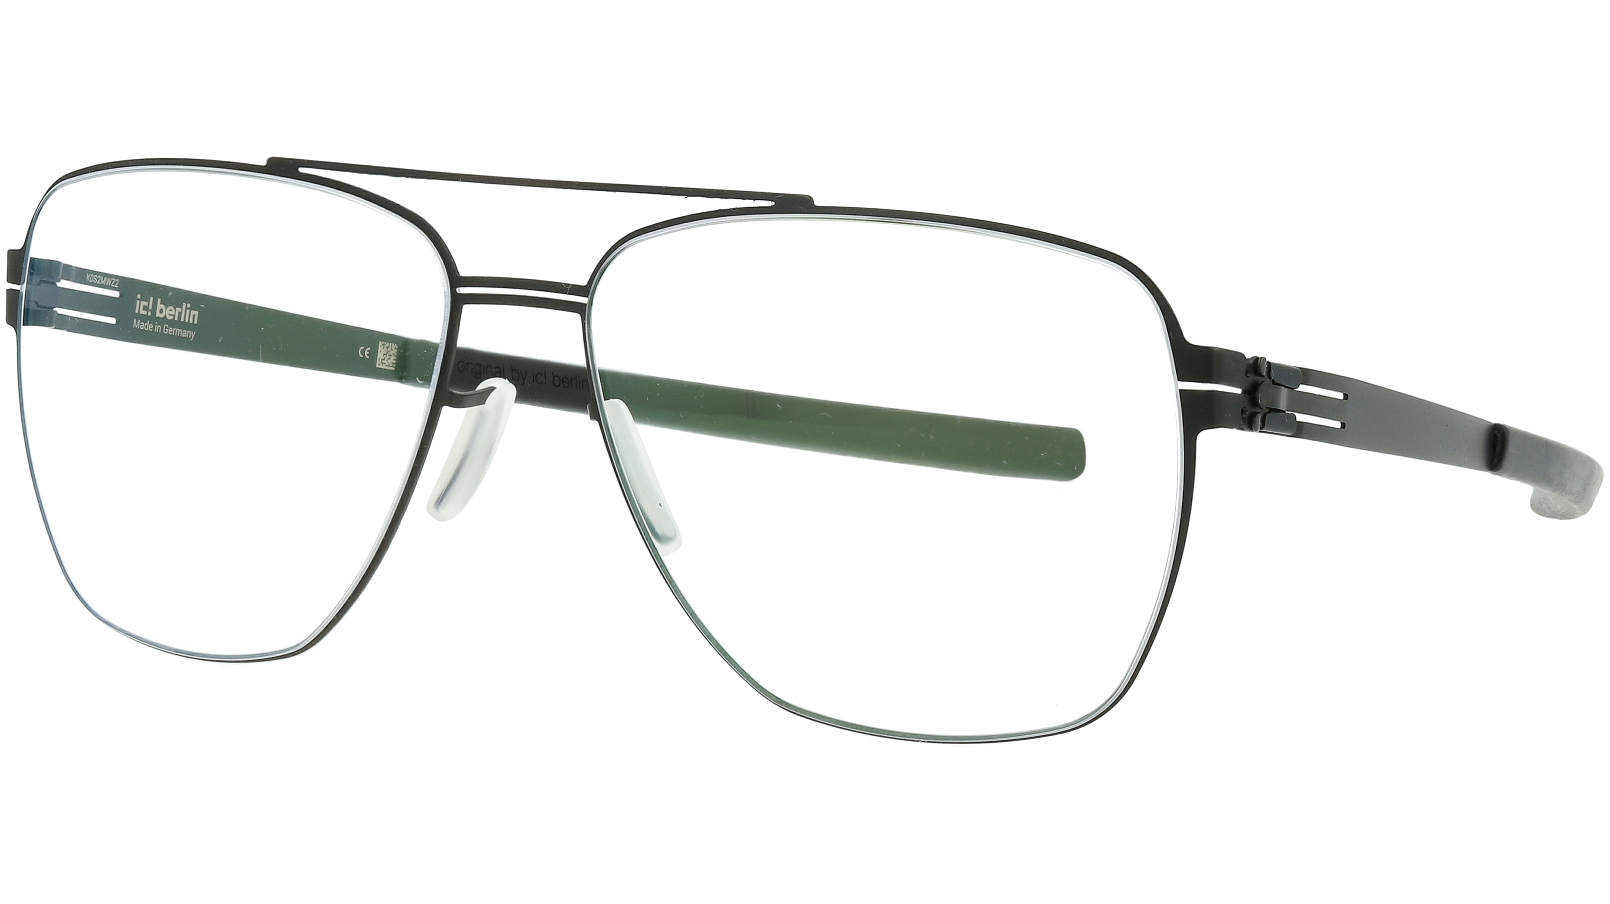 IC BERLIN! Francesca M Black Aviator Glasses